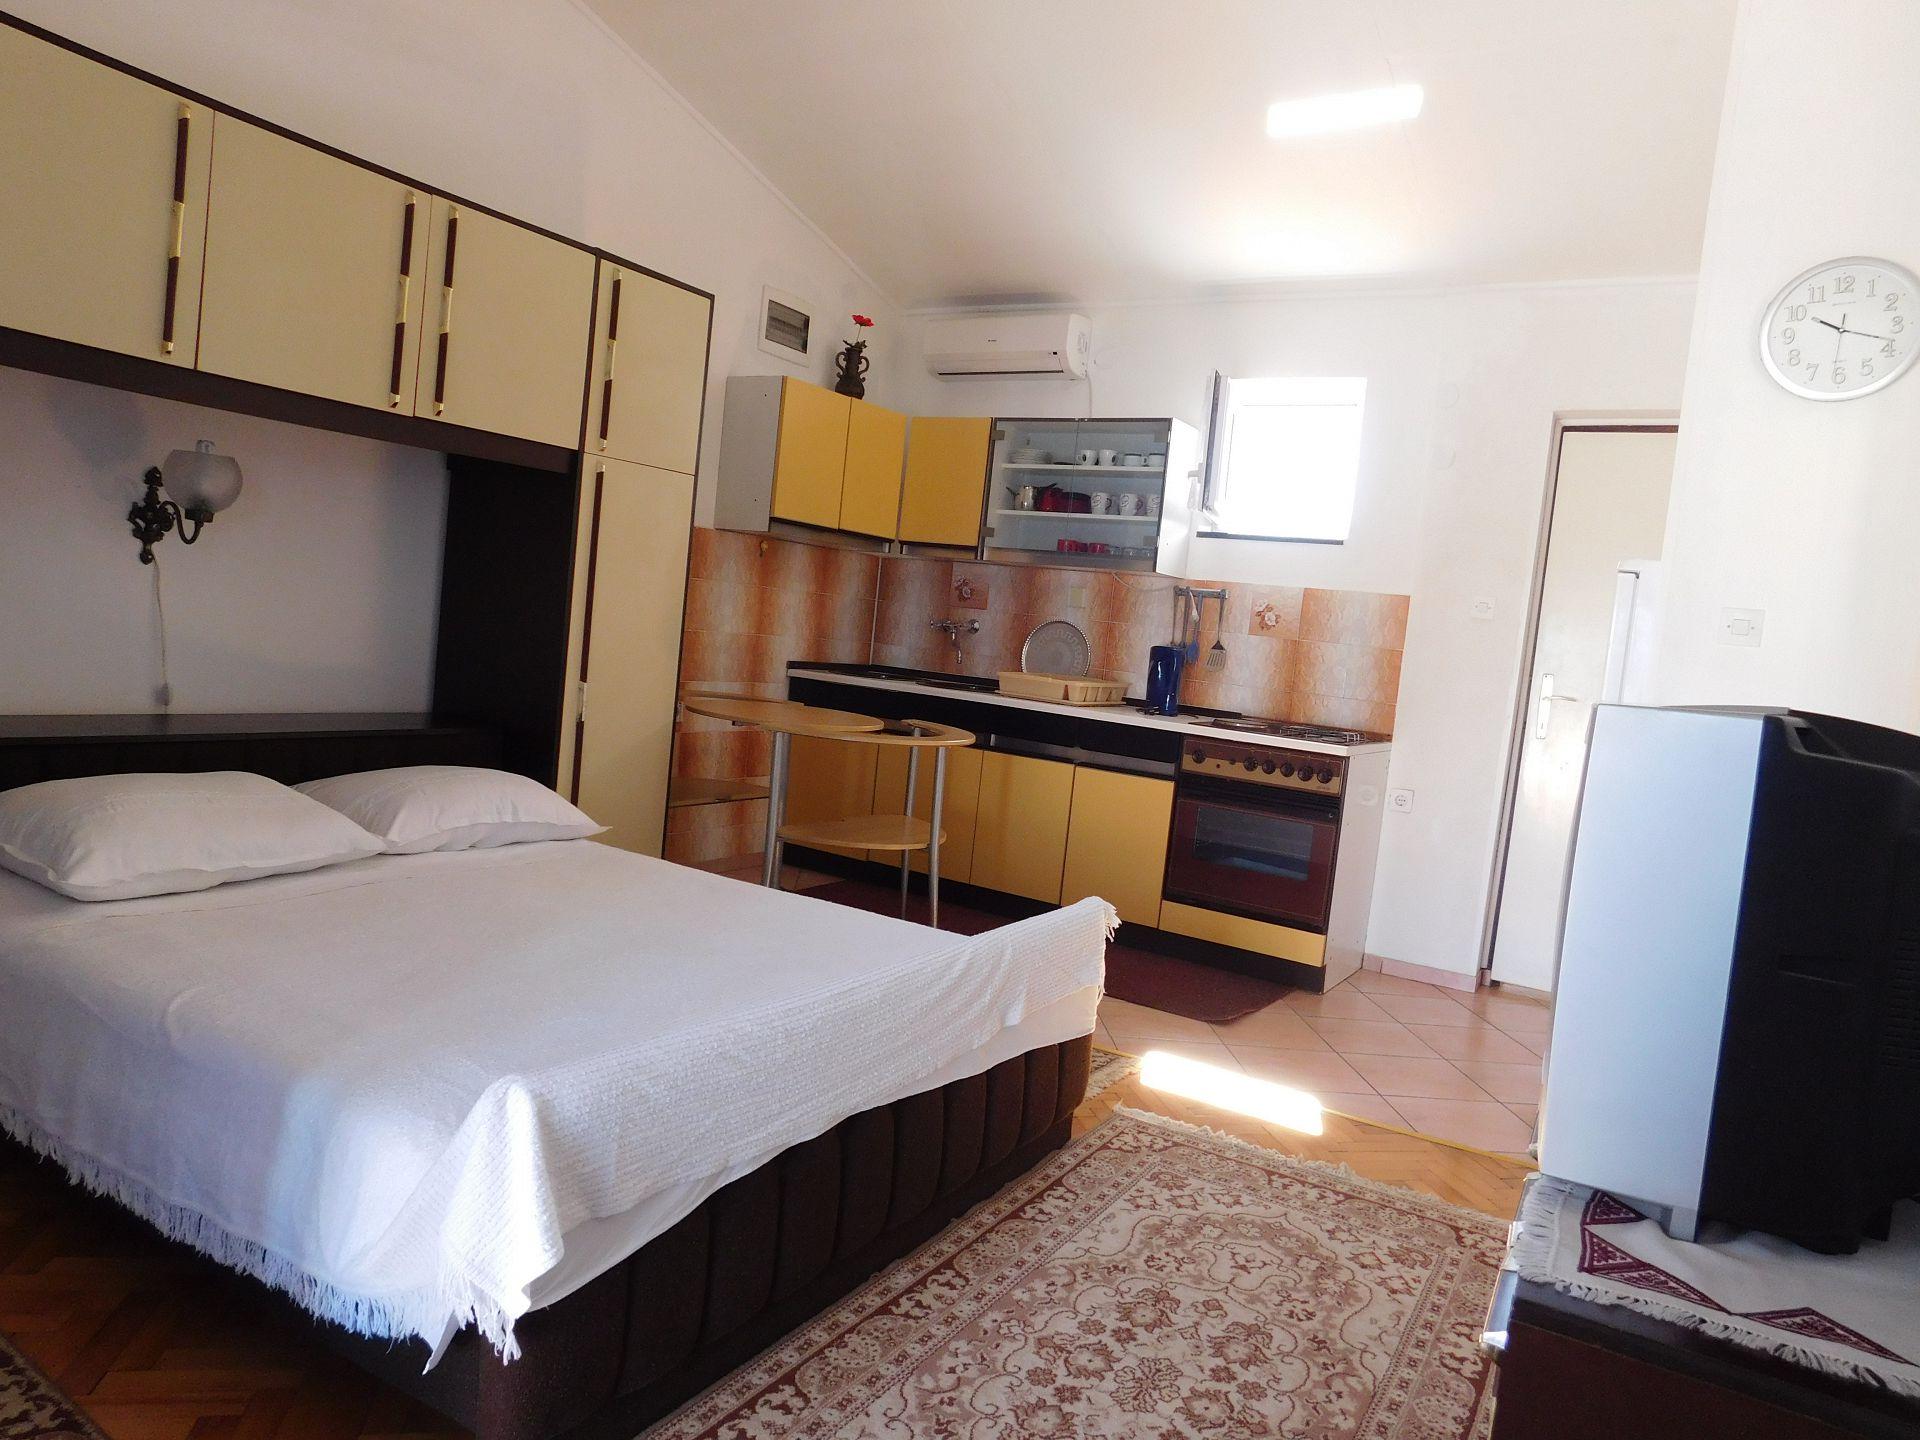 Ferienwohnung Lado SA2(2+1) - Muline (741847), Ugljan, Insel Ugljan, Dalmatien, Kroatien, Bild 13